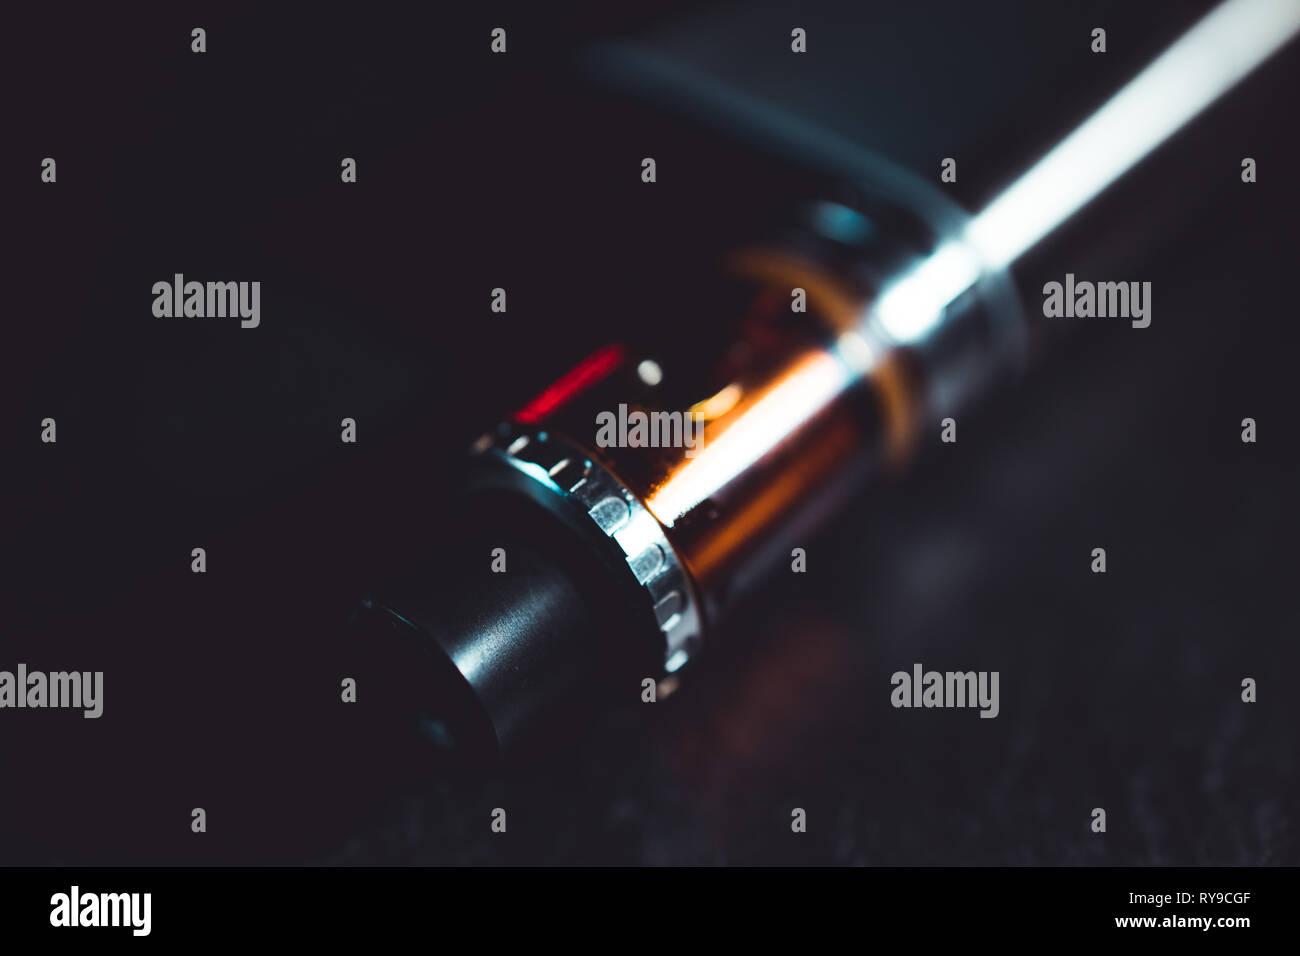 Vape pen metal electronic cigarette with vaping dark background - Stock Image